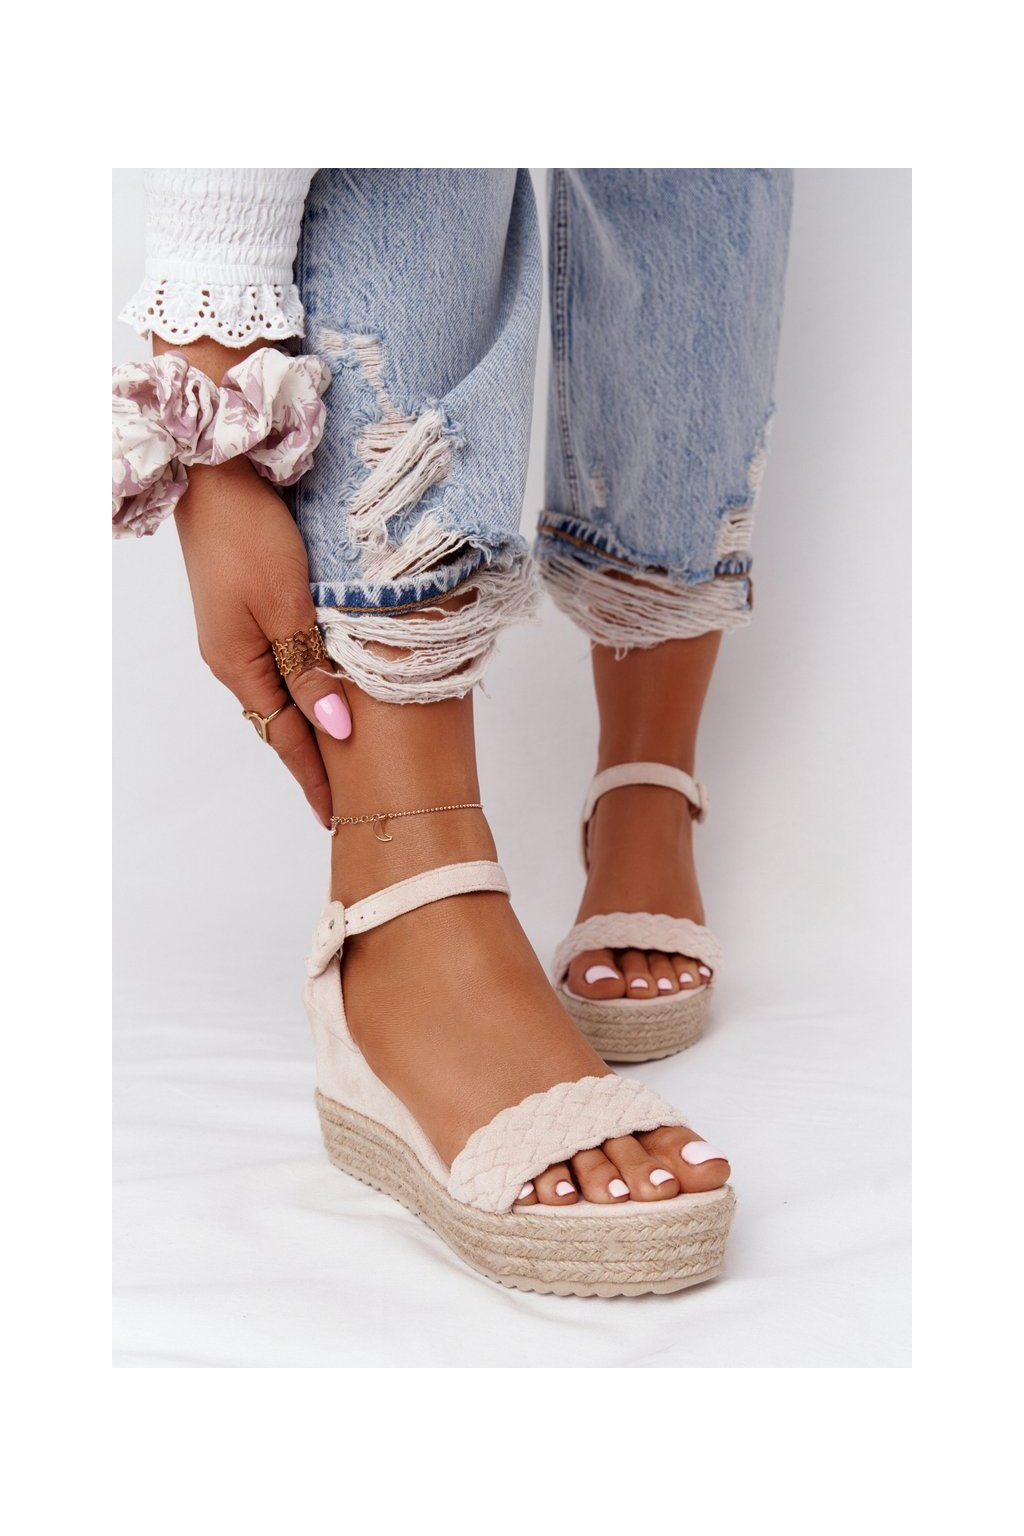 Hnedé sandále NJSK XY12 BEIGE